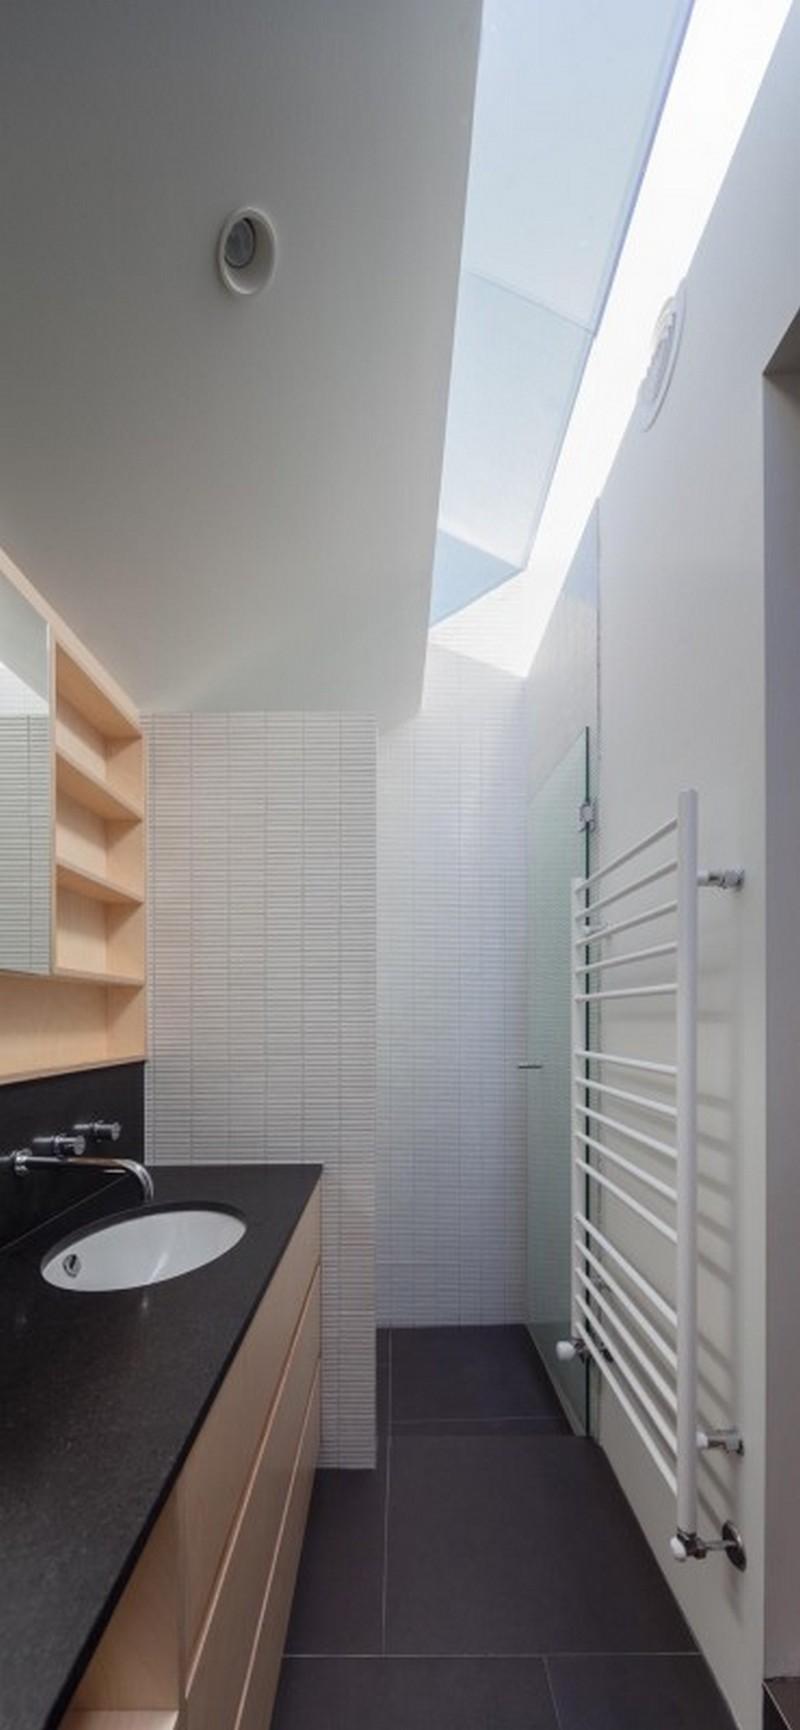 design-estate Designer Living Bridge House Delia Teschevdorff 1